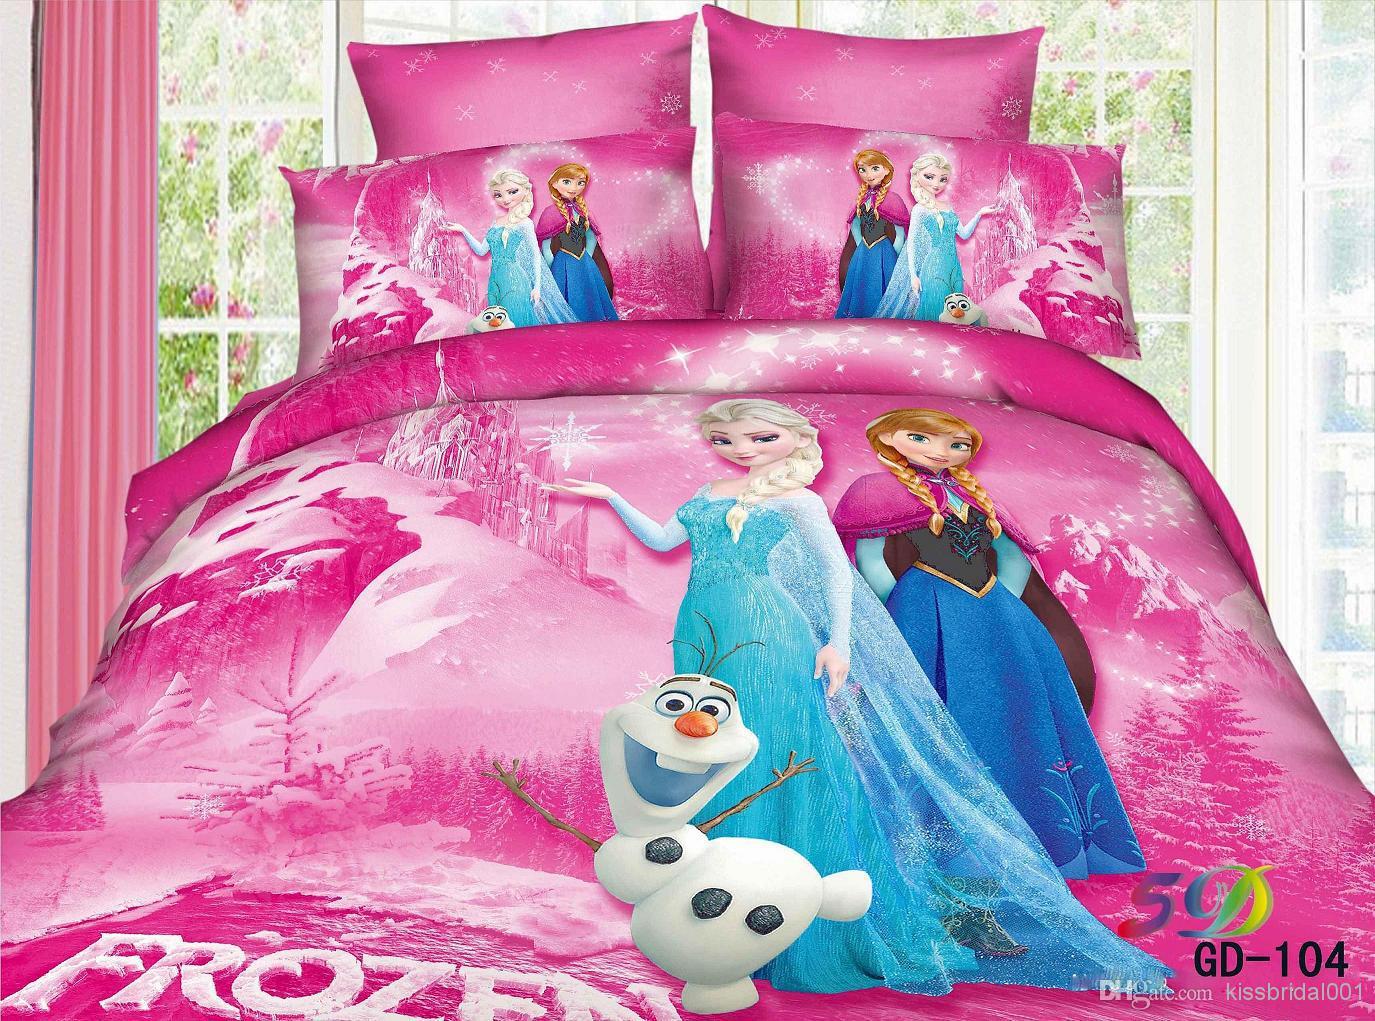 Cheap Bedding Set - Best Frozen 3d Kids Bedding Sets Elsa Anna Olaf Online with $109.95/Piece | DHgate